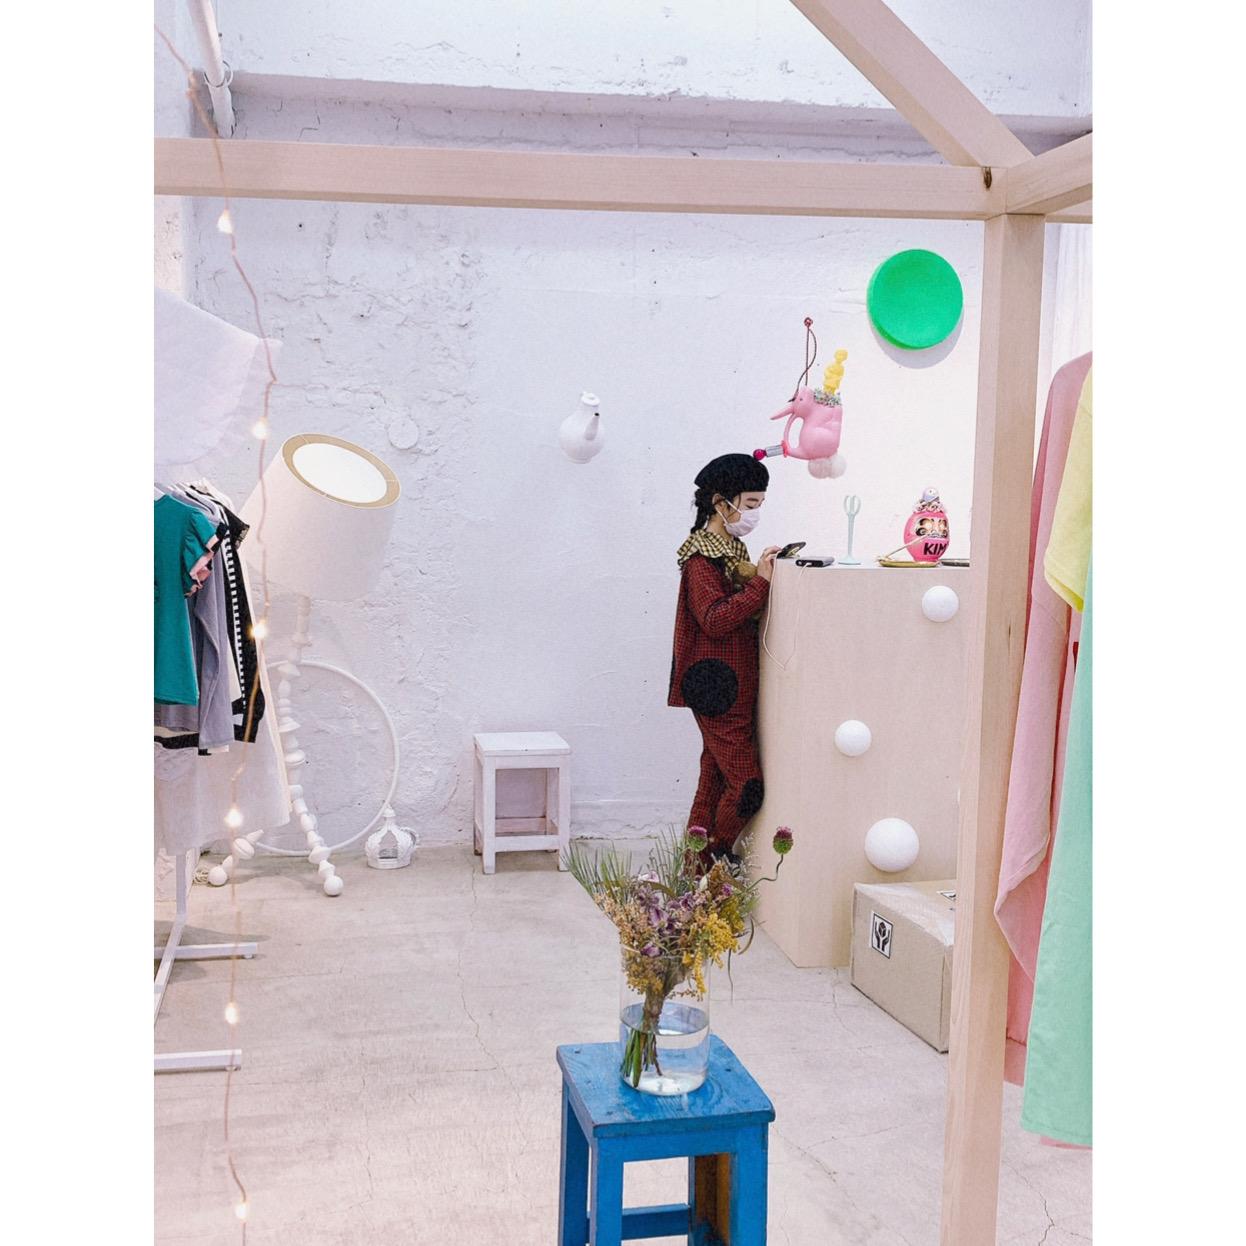 frankygrow concept shop Tokyo ☺︎